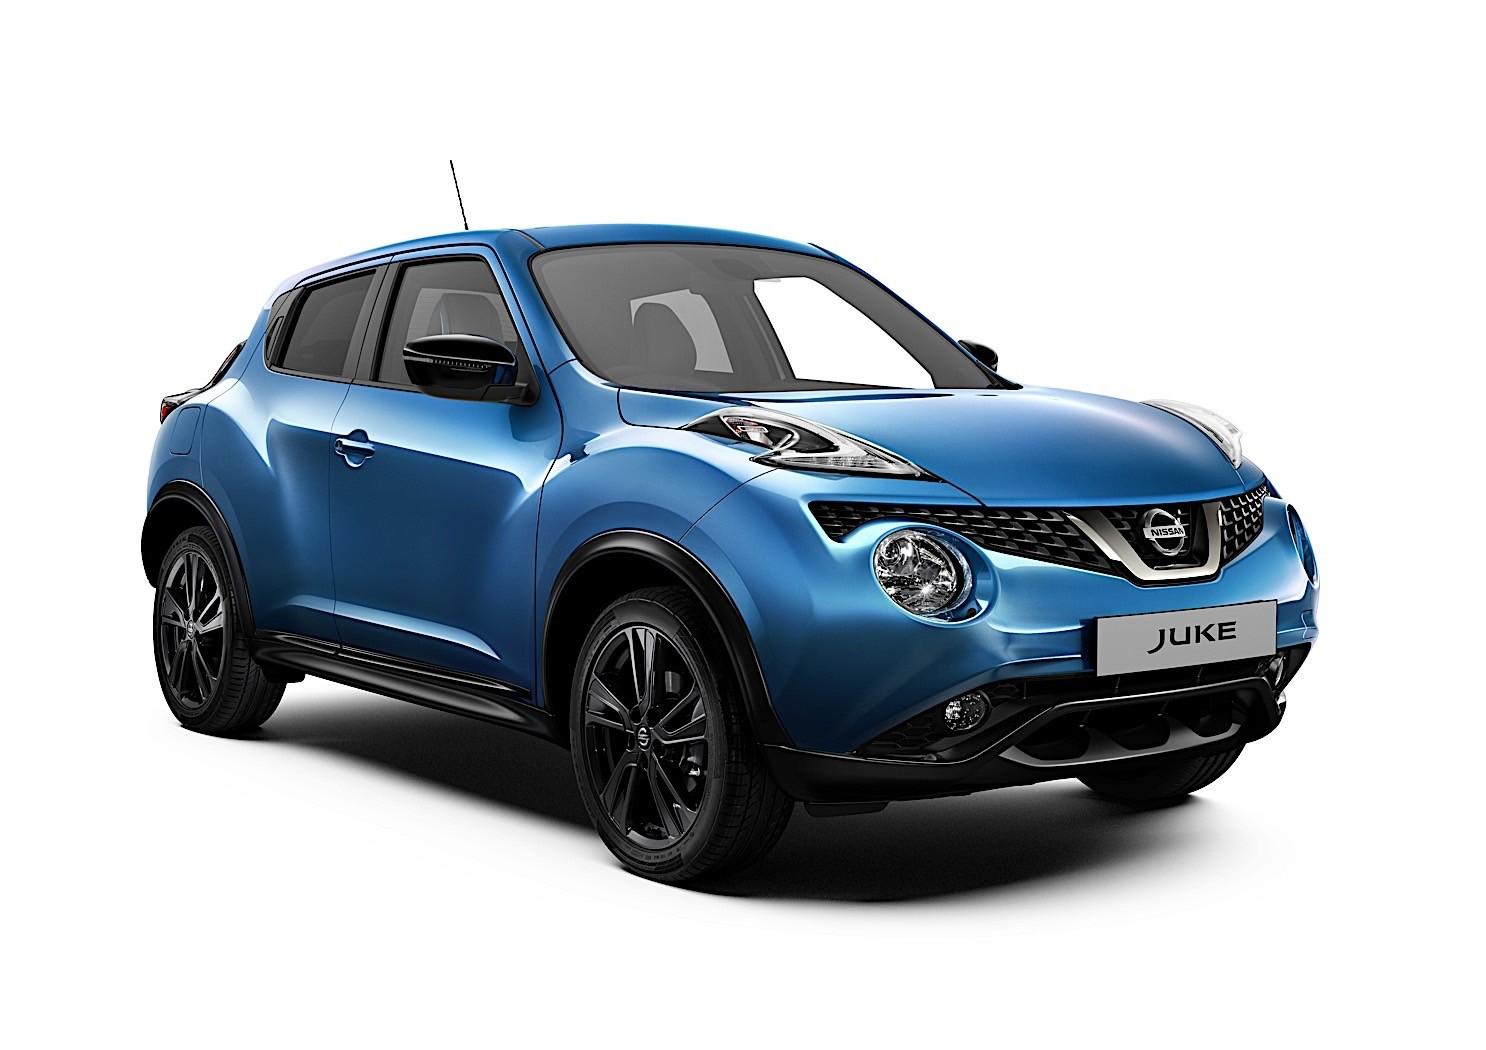 2018 Nissan Juke Spyshots